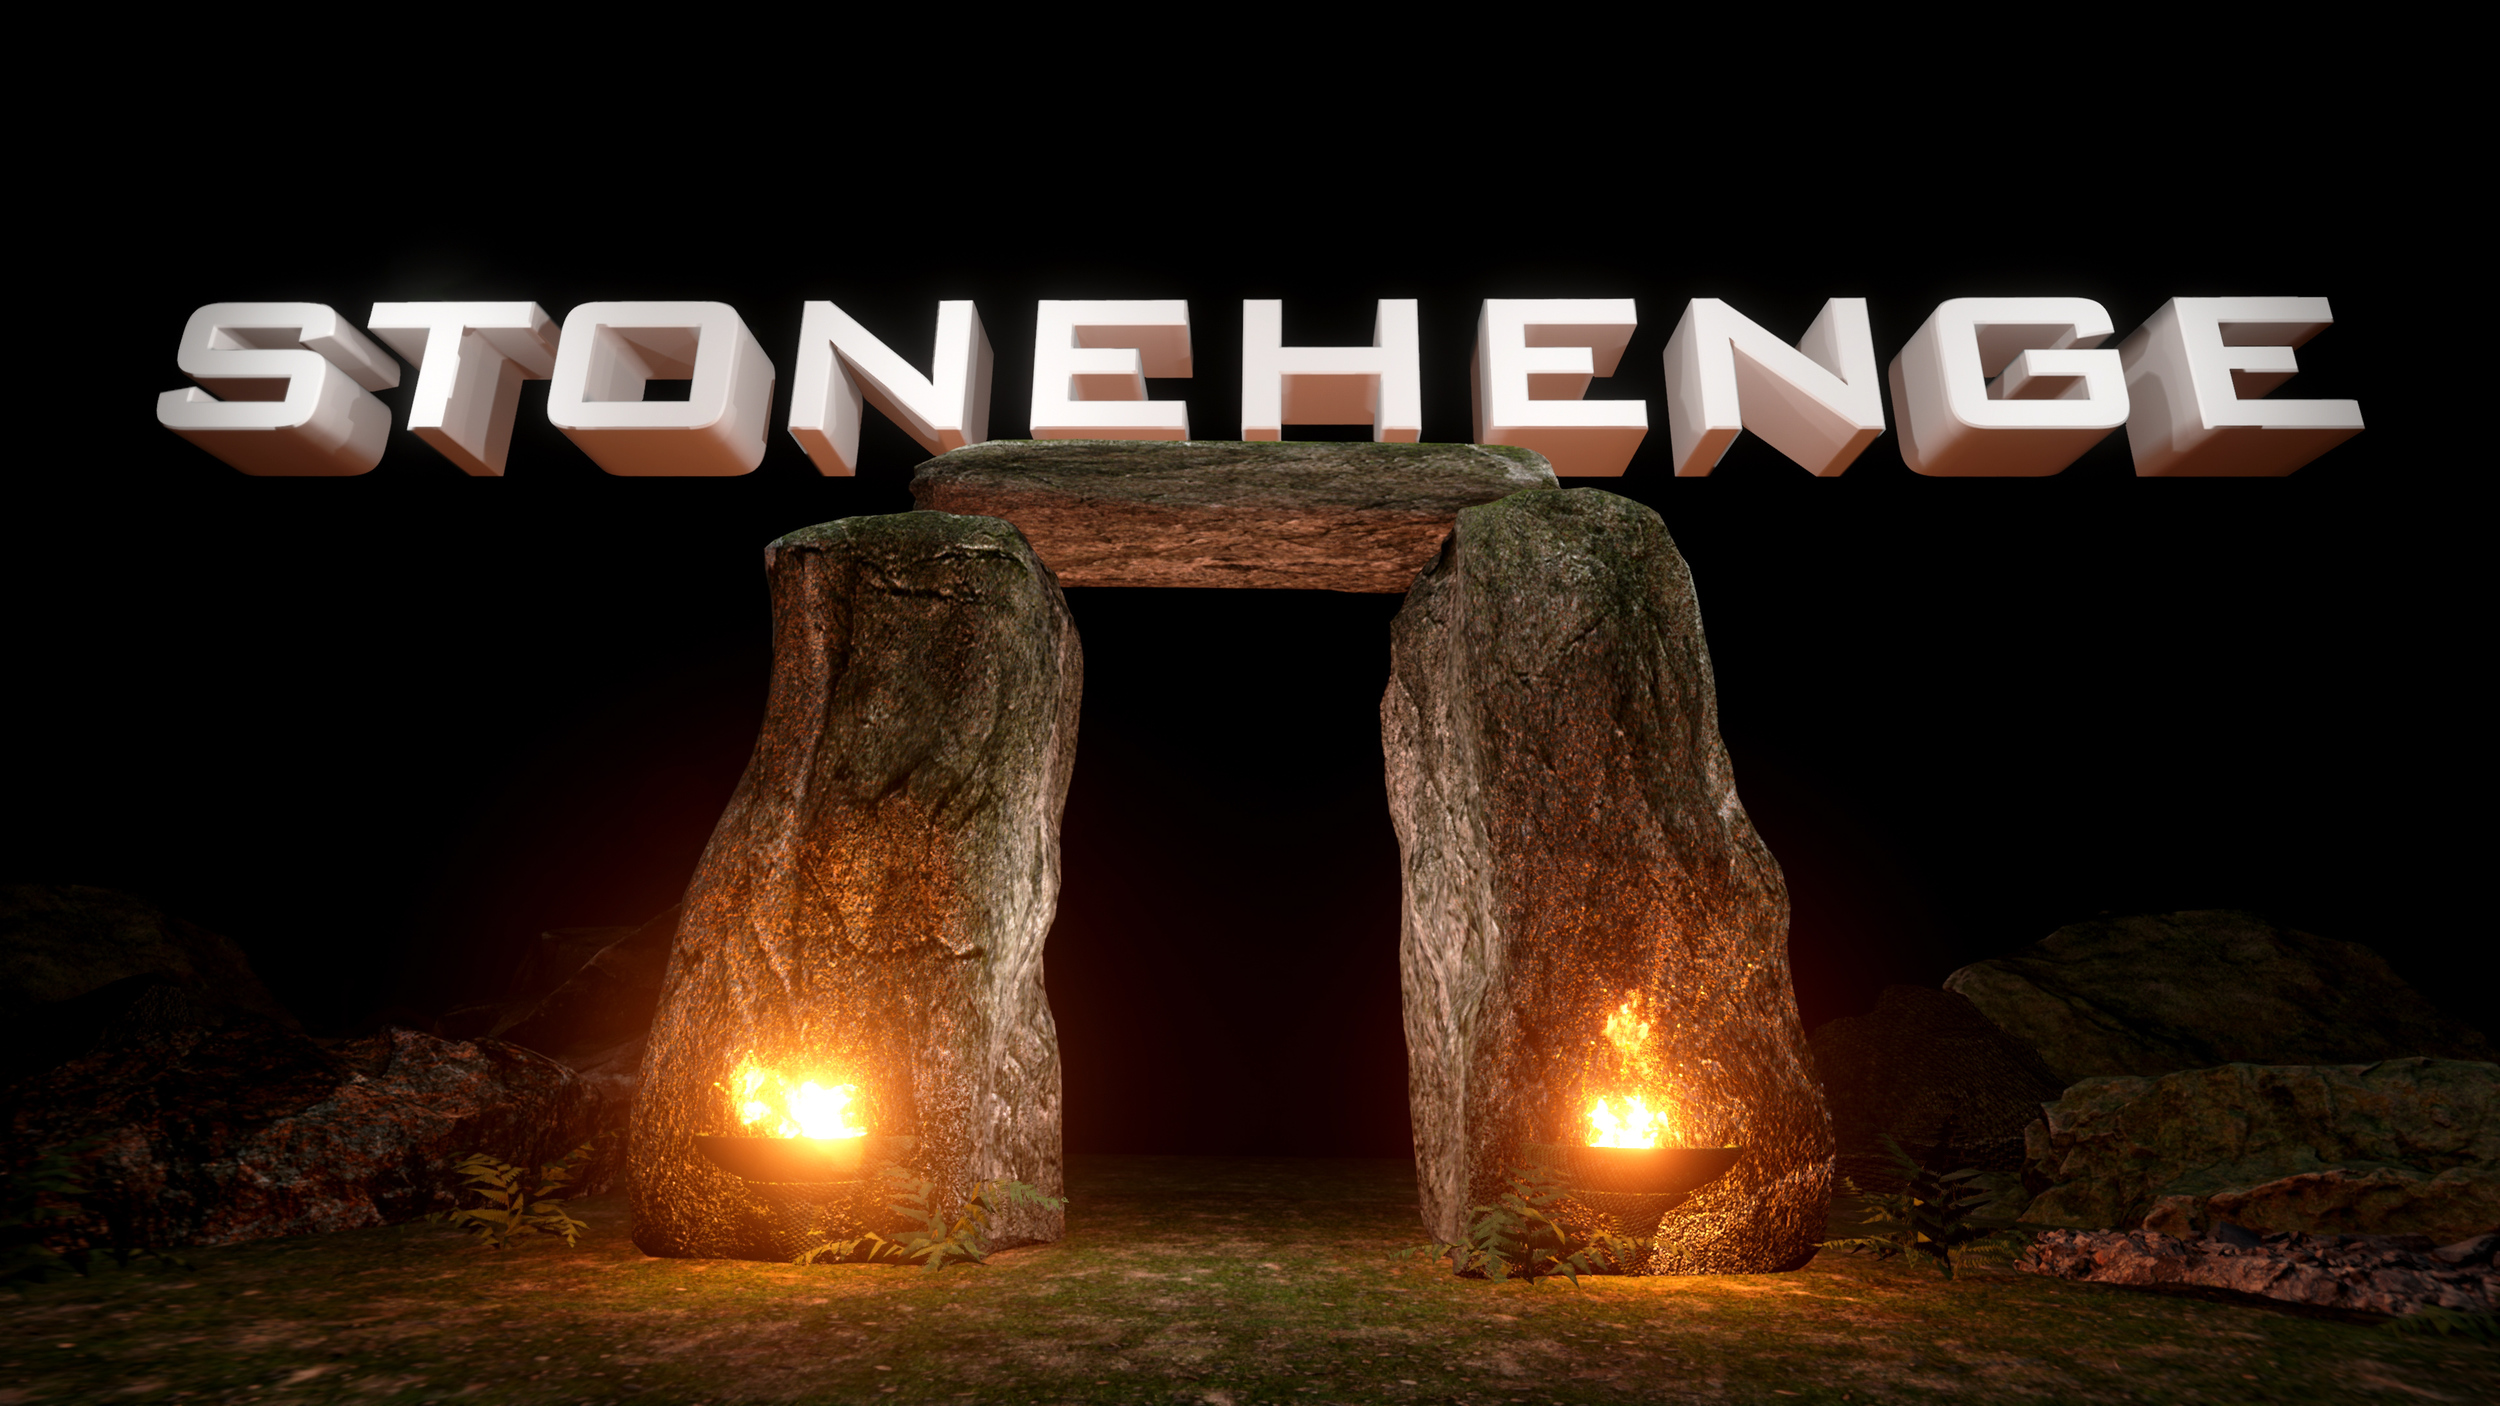 Stonehenge_Trailler_04.00_00_09_26.Still002.jpg